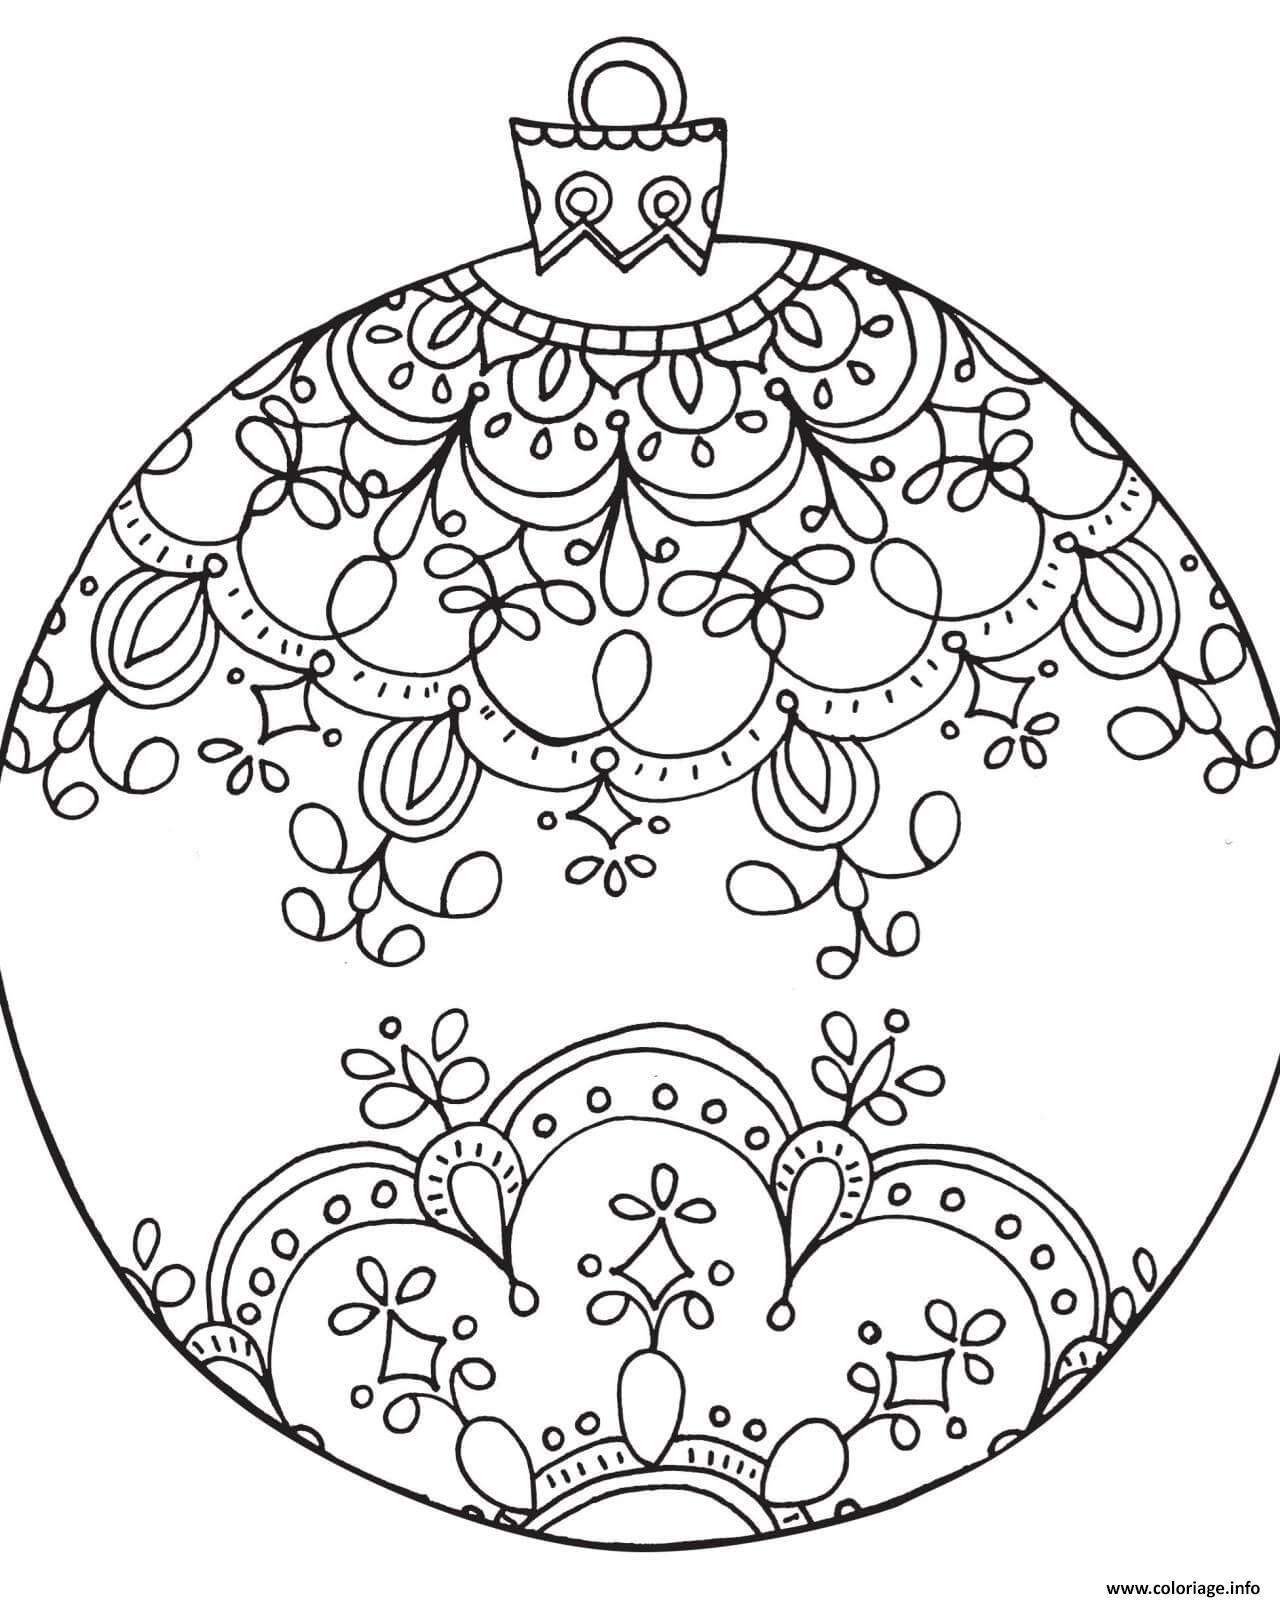 Coloriage Boule De Noel Adulte Noel dessin